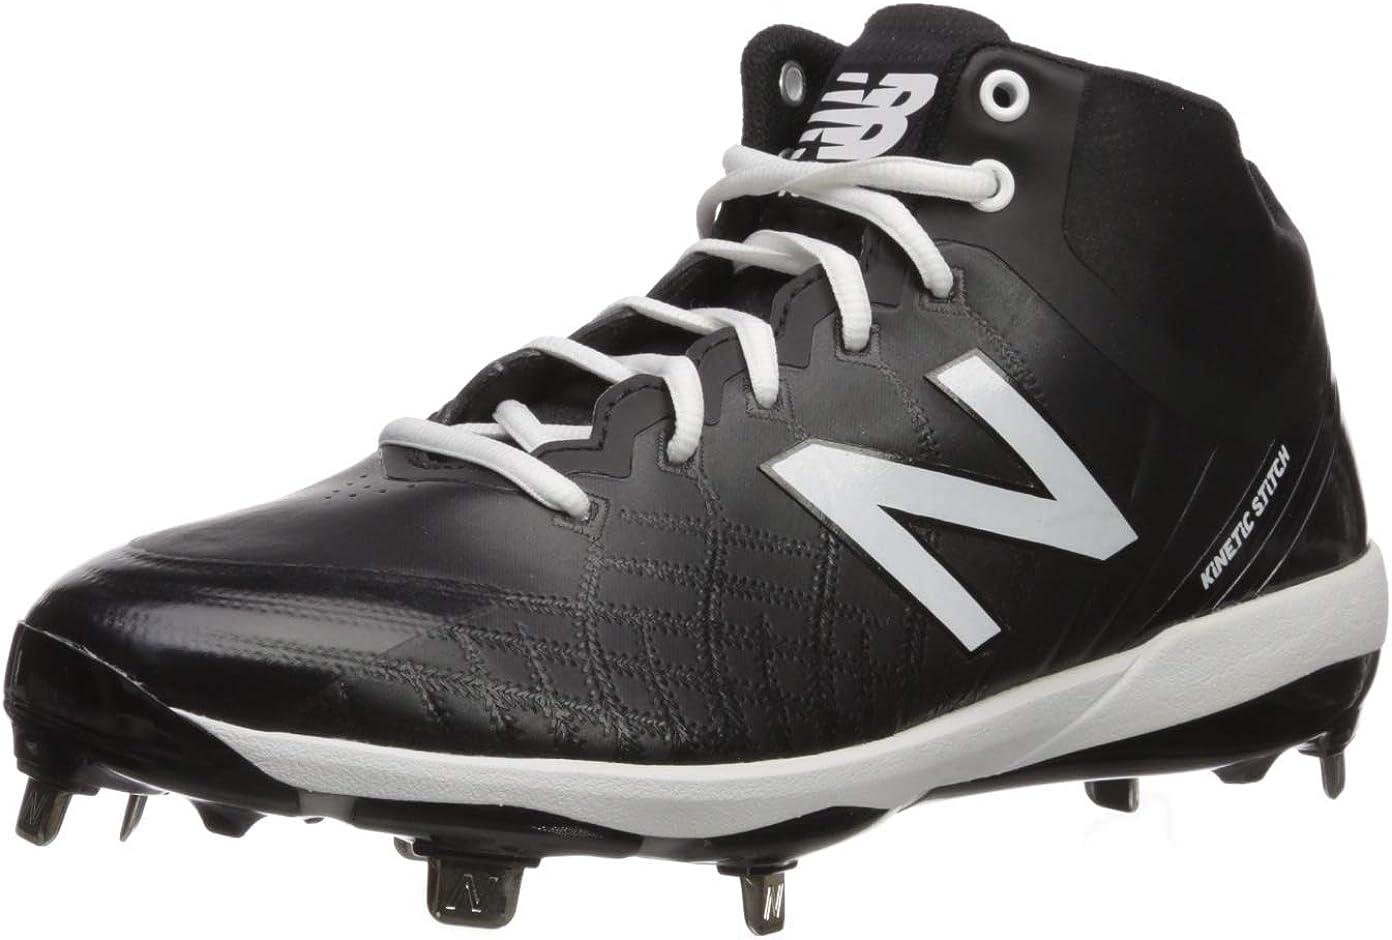 Image of Baseball & Softball New Balance Men's 4040v5 Metal Mid-Cut Baseball Shoe